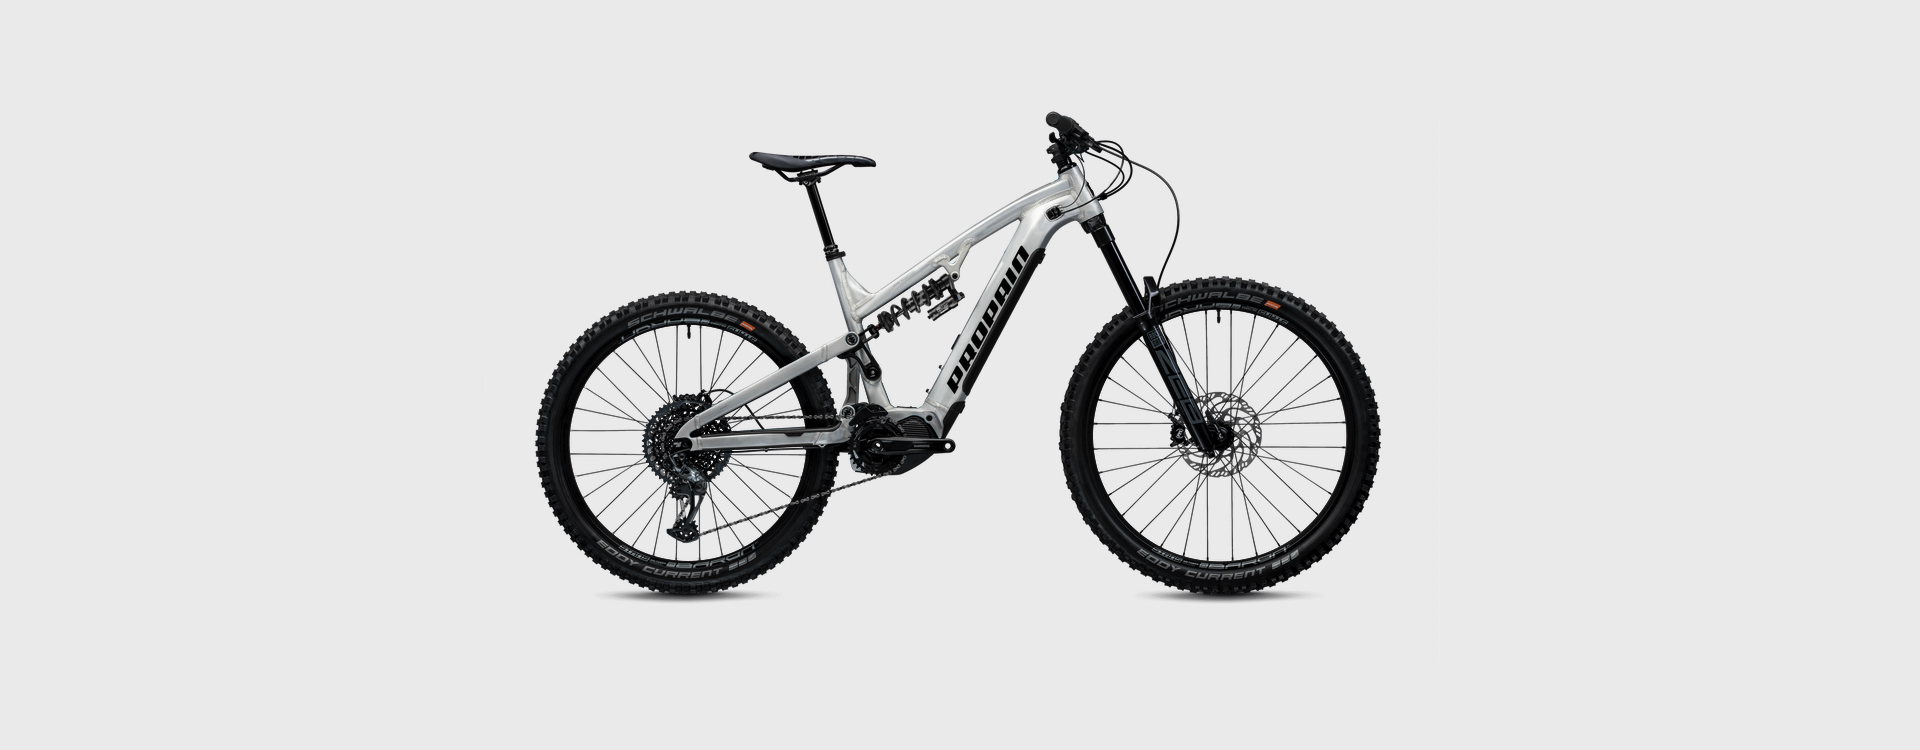 Bike Verleih Bad Salzdetfurth Propain Bikes Testcenter Niedersachsen Ekano 8 - AL - L - 29 - Raw - 1920x750